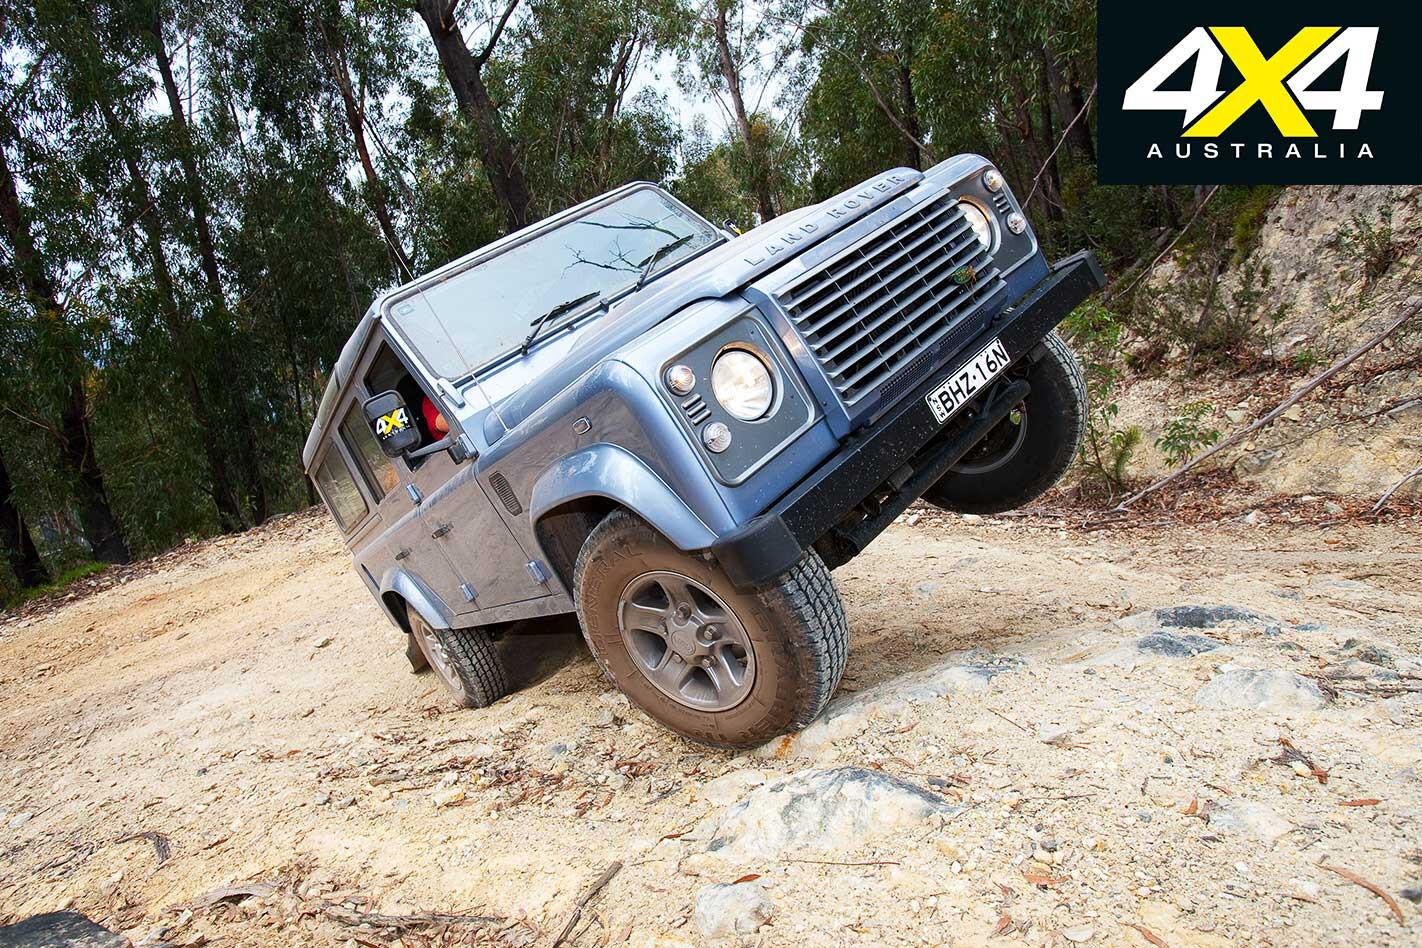 2009 Land Rover Defender Off Road Capability Jpg